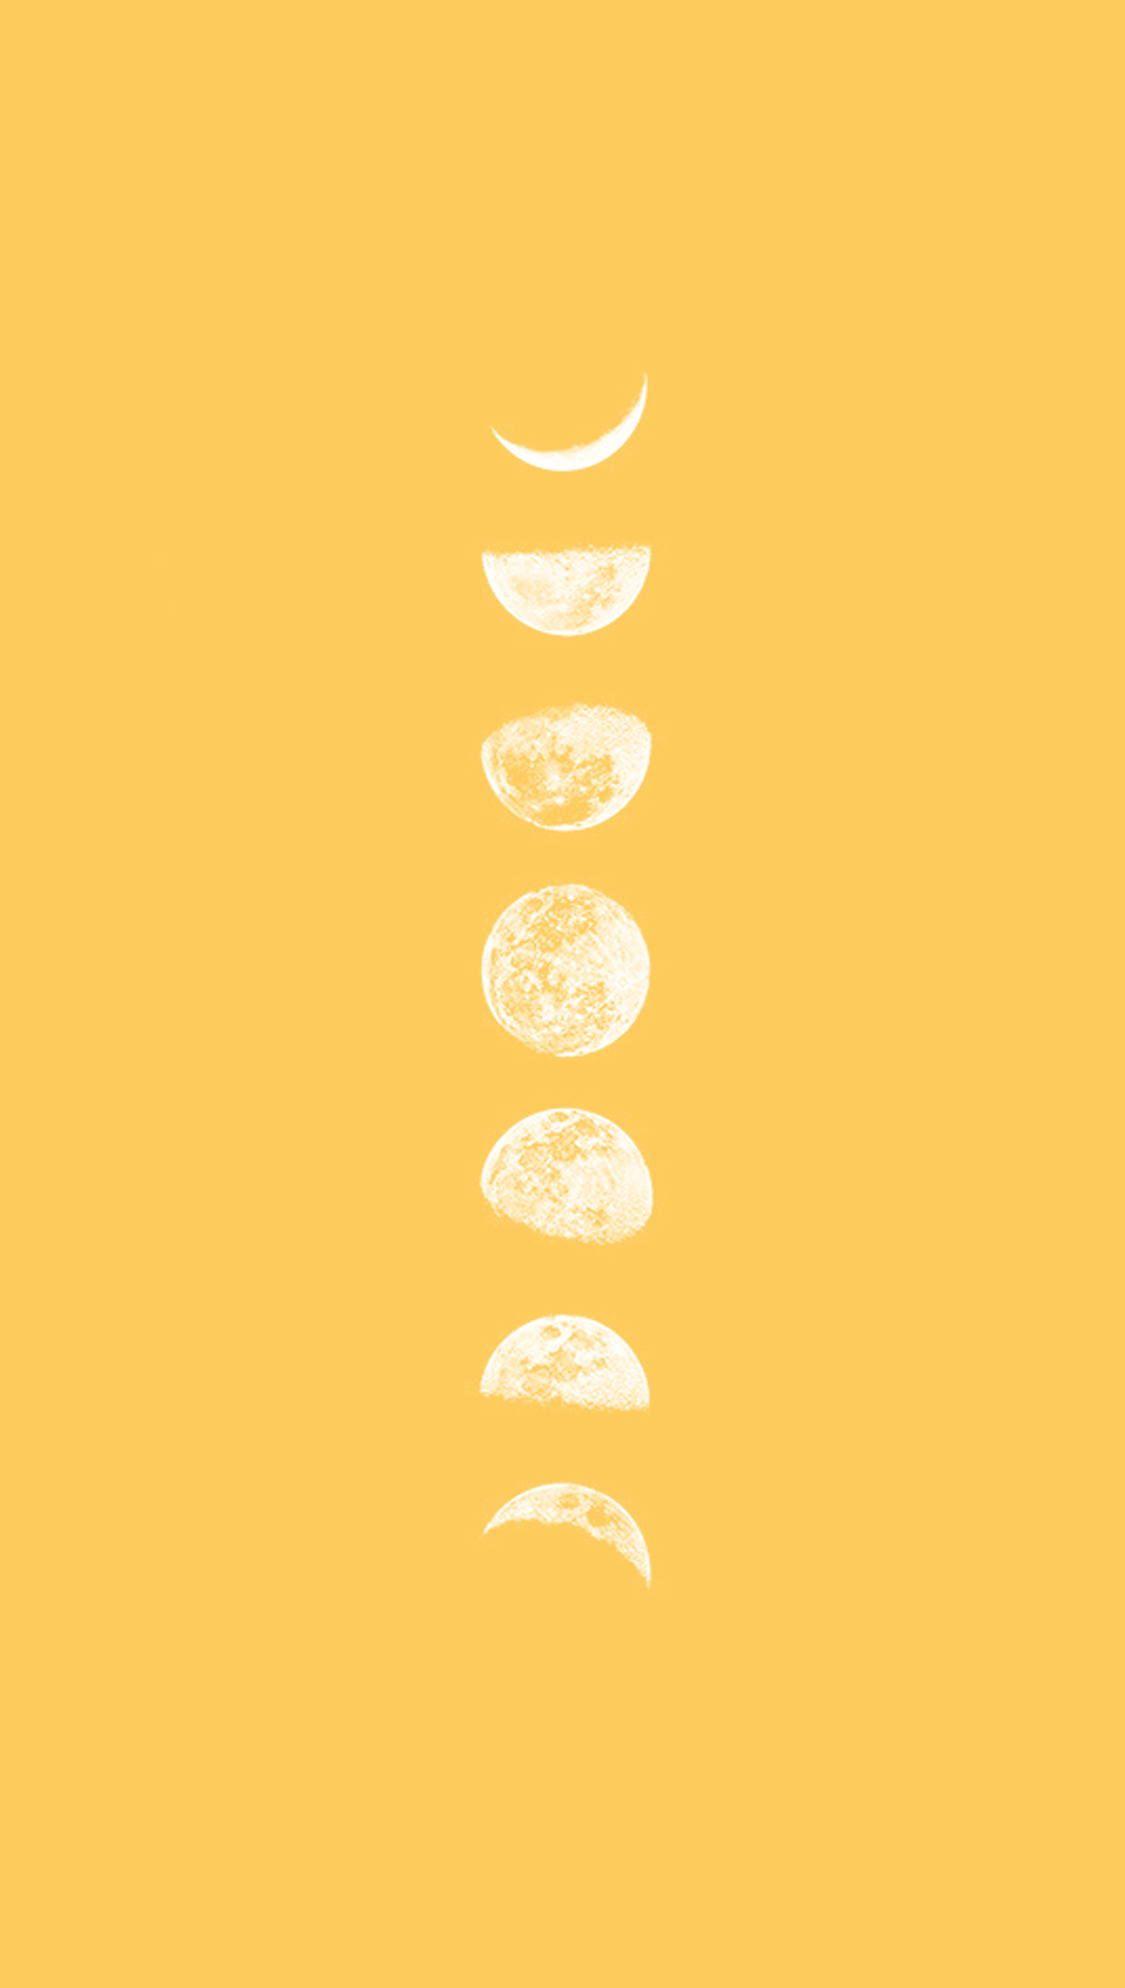 35 Yellow Aesthetic Wallpaper Iphone Wallpaper Yellow Yellow Aesthetic Pastel Yellow Wallpaper